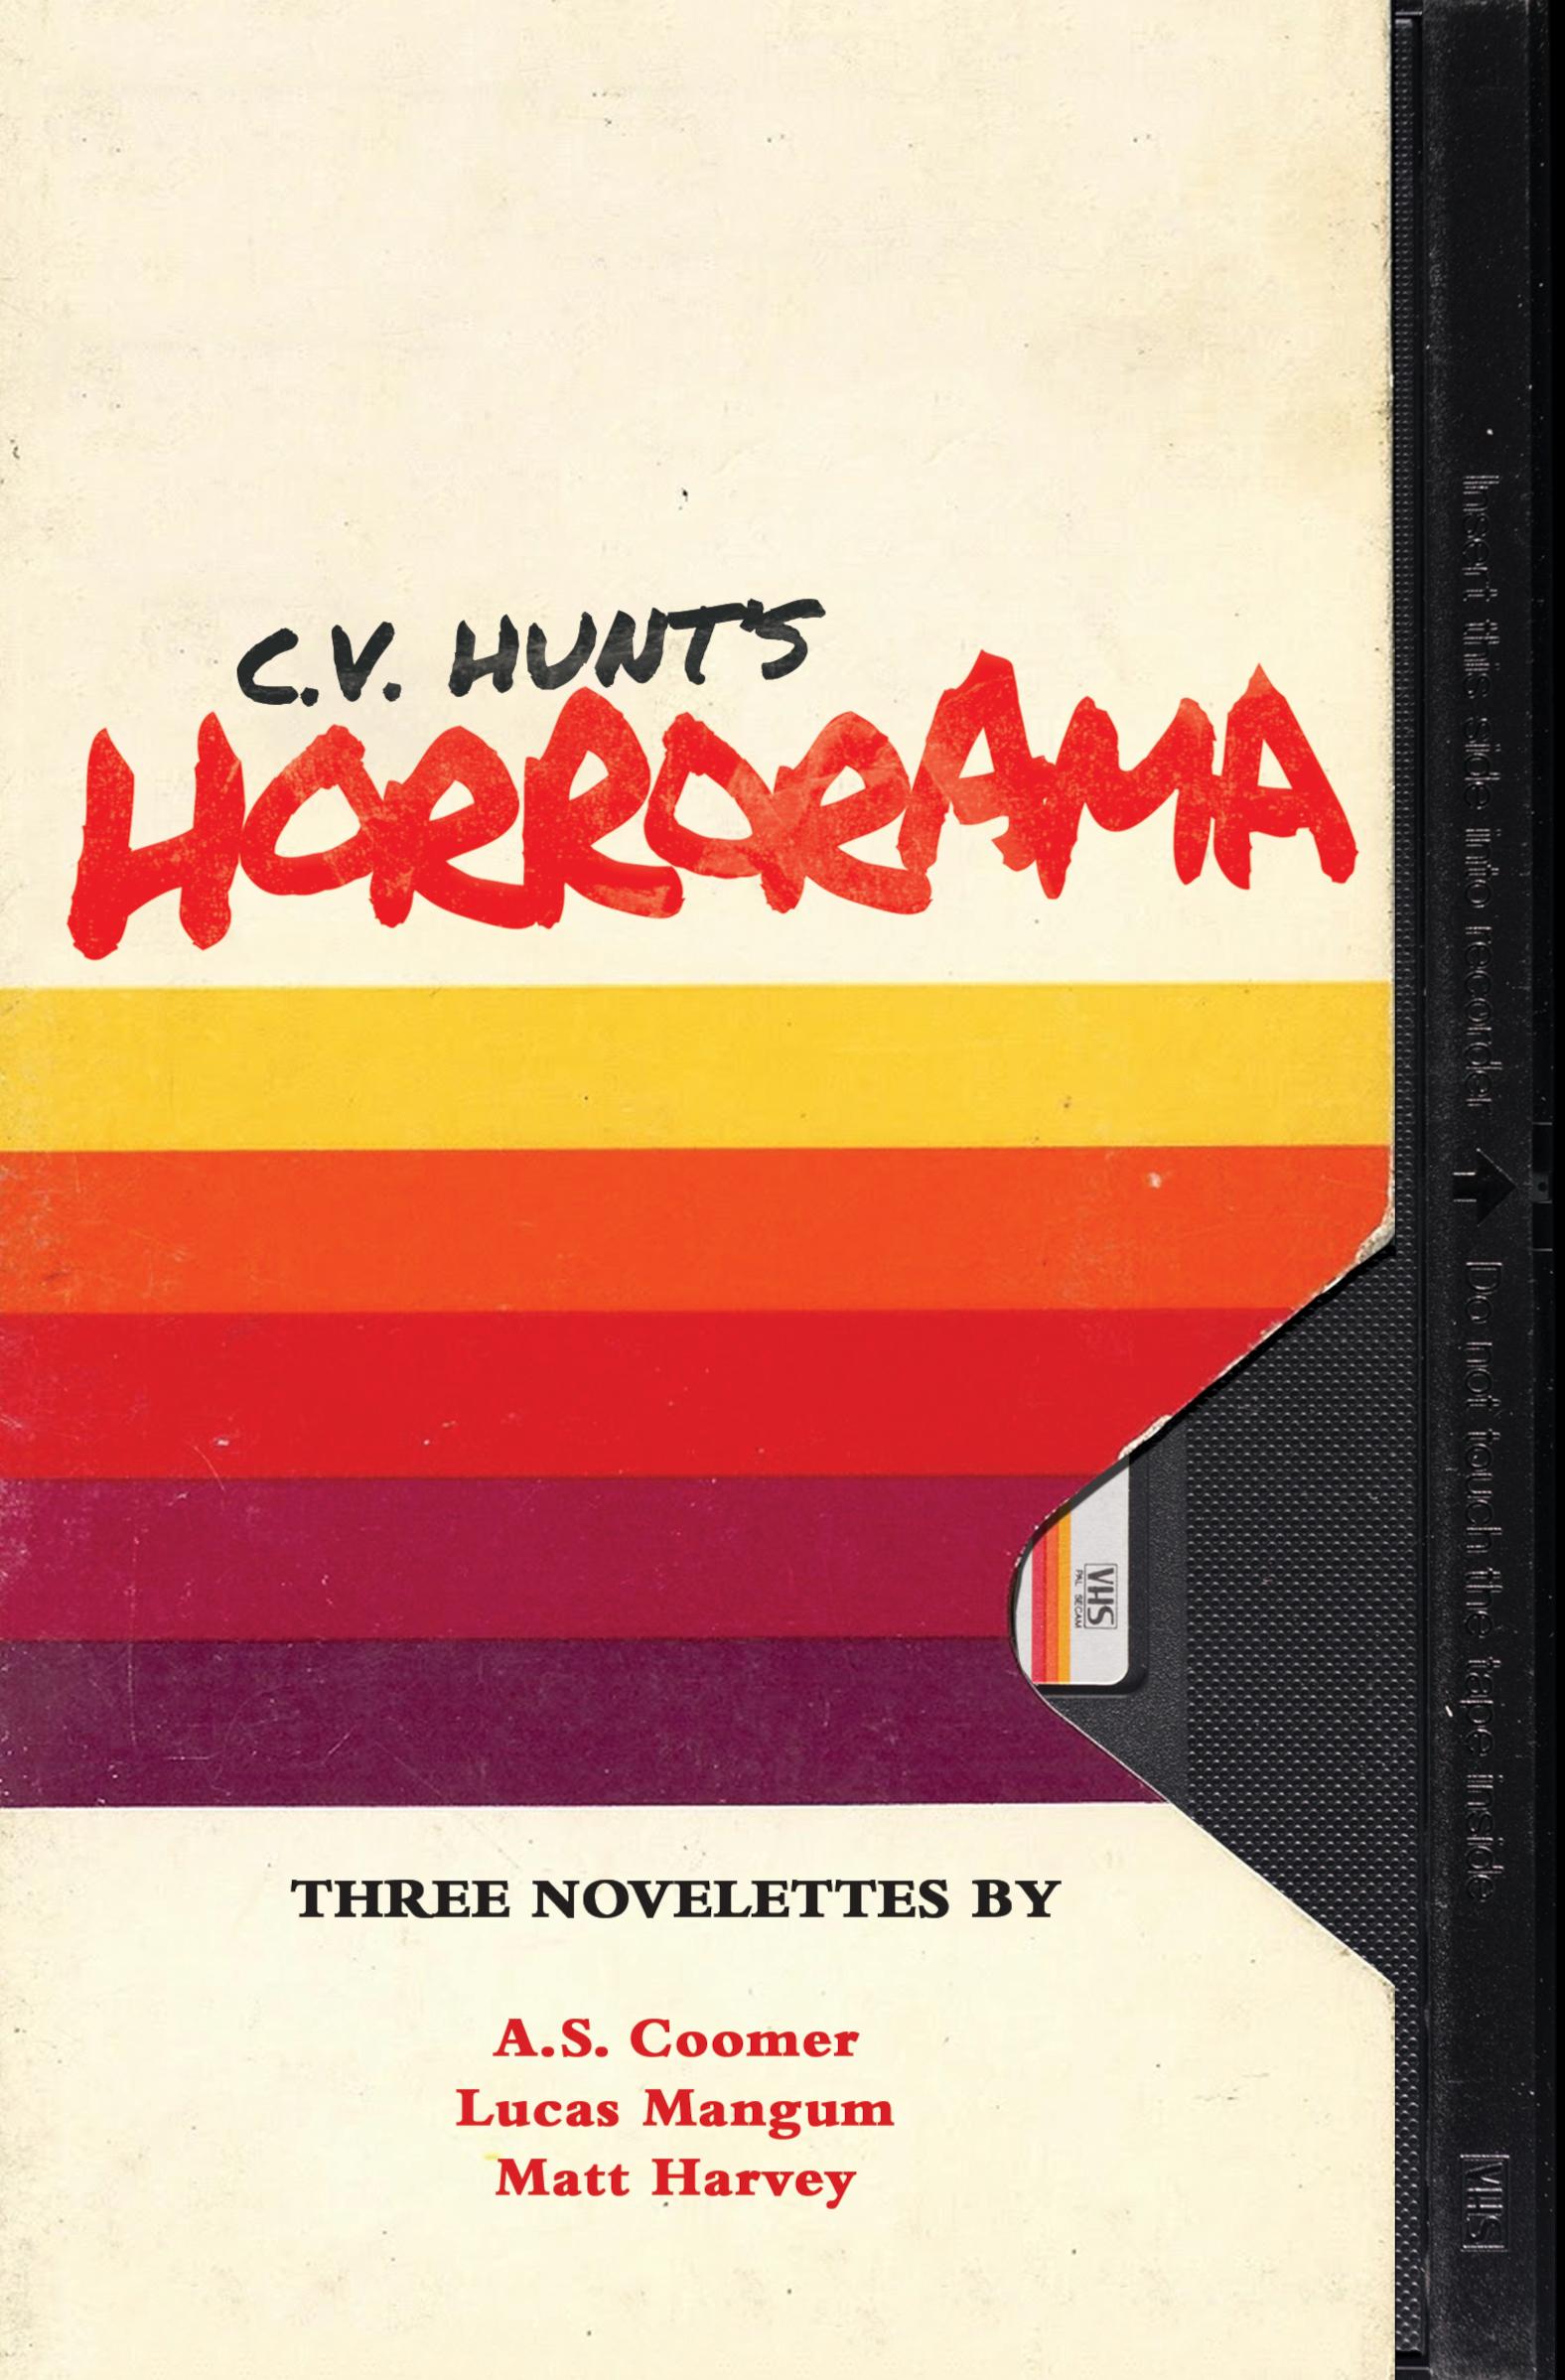 Horrorama by C.V. Hunt, A.S. Coomer, Lucas Mangum, Matt Harvey